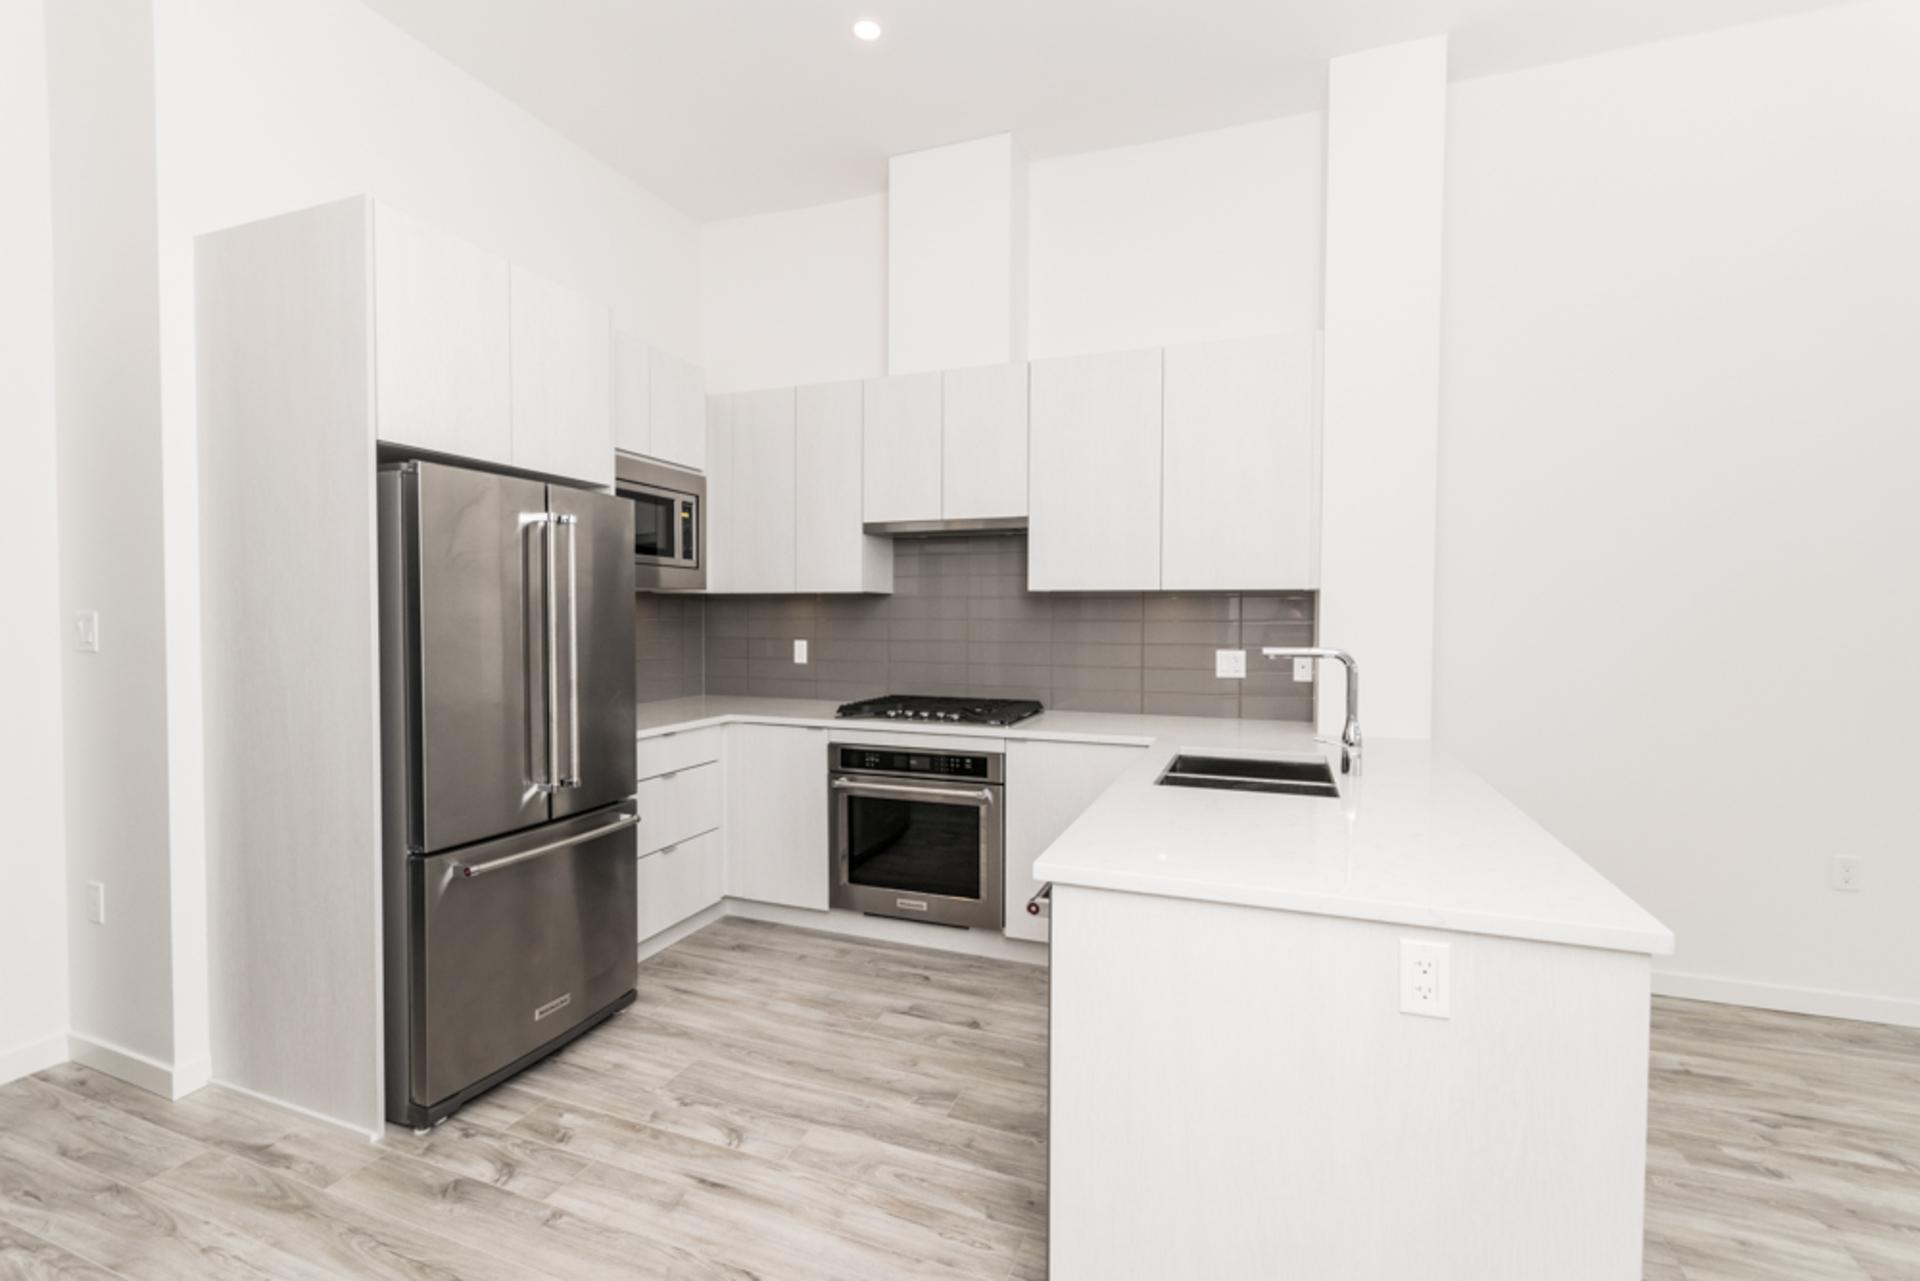 Kitchen at 605 - 621 Regan, Coquitlam